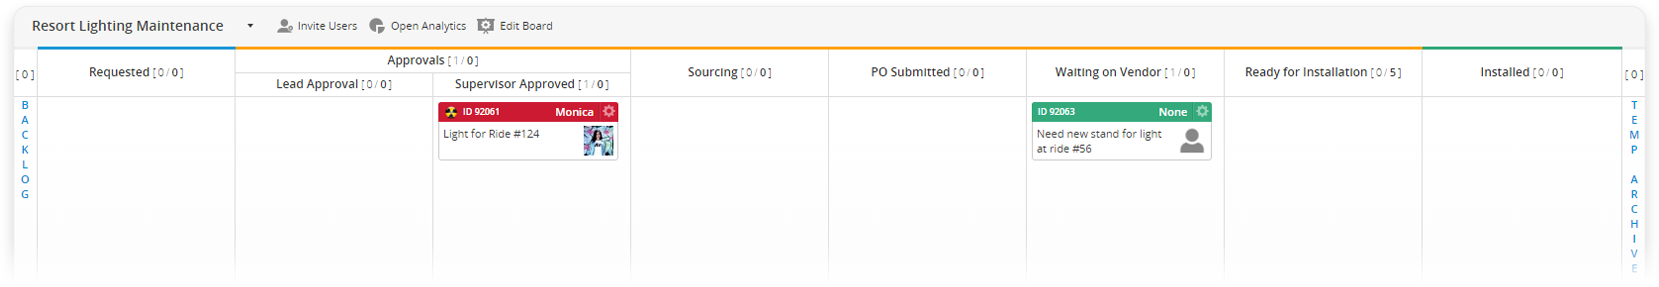 CaseStudy_OrlandThemePark_BoardScreenshot_bestone